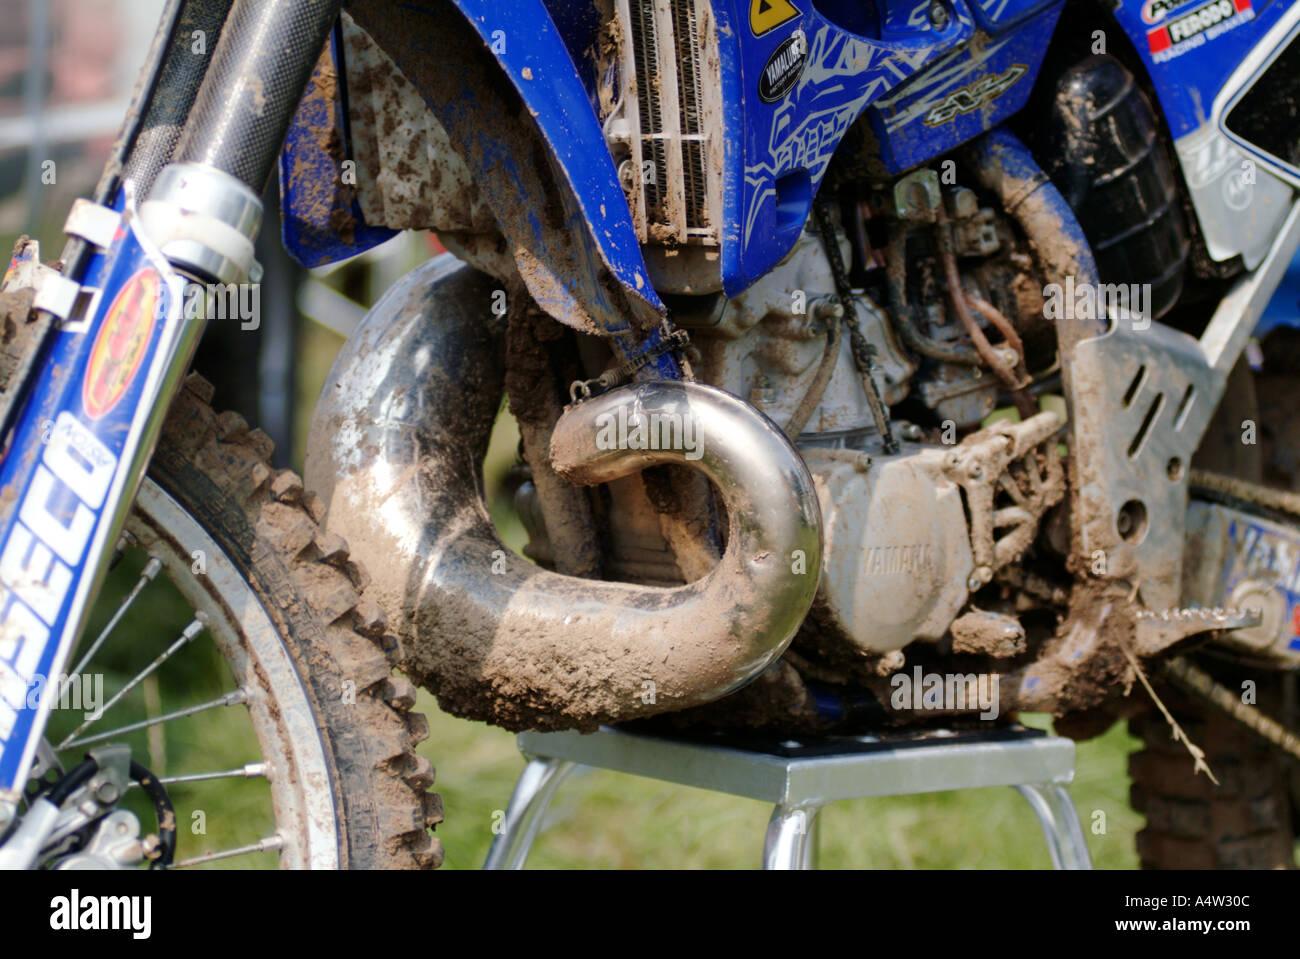 Two 2 Stroke Expansion Pipe Motor Cross X Moto Dirt Bike Scramble